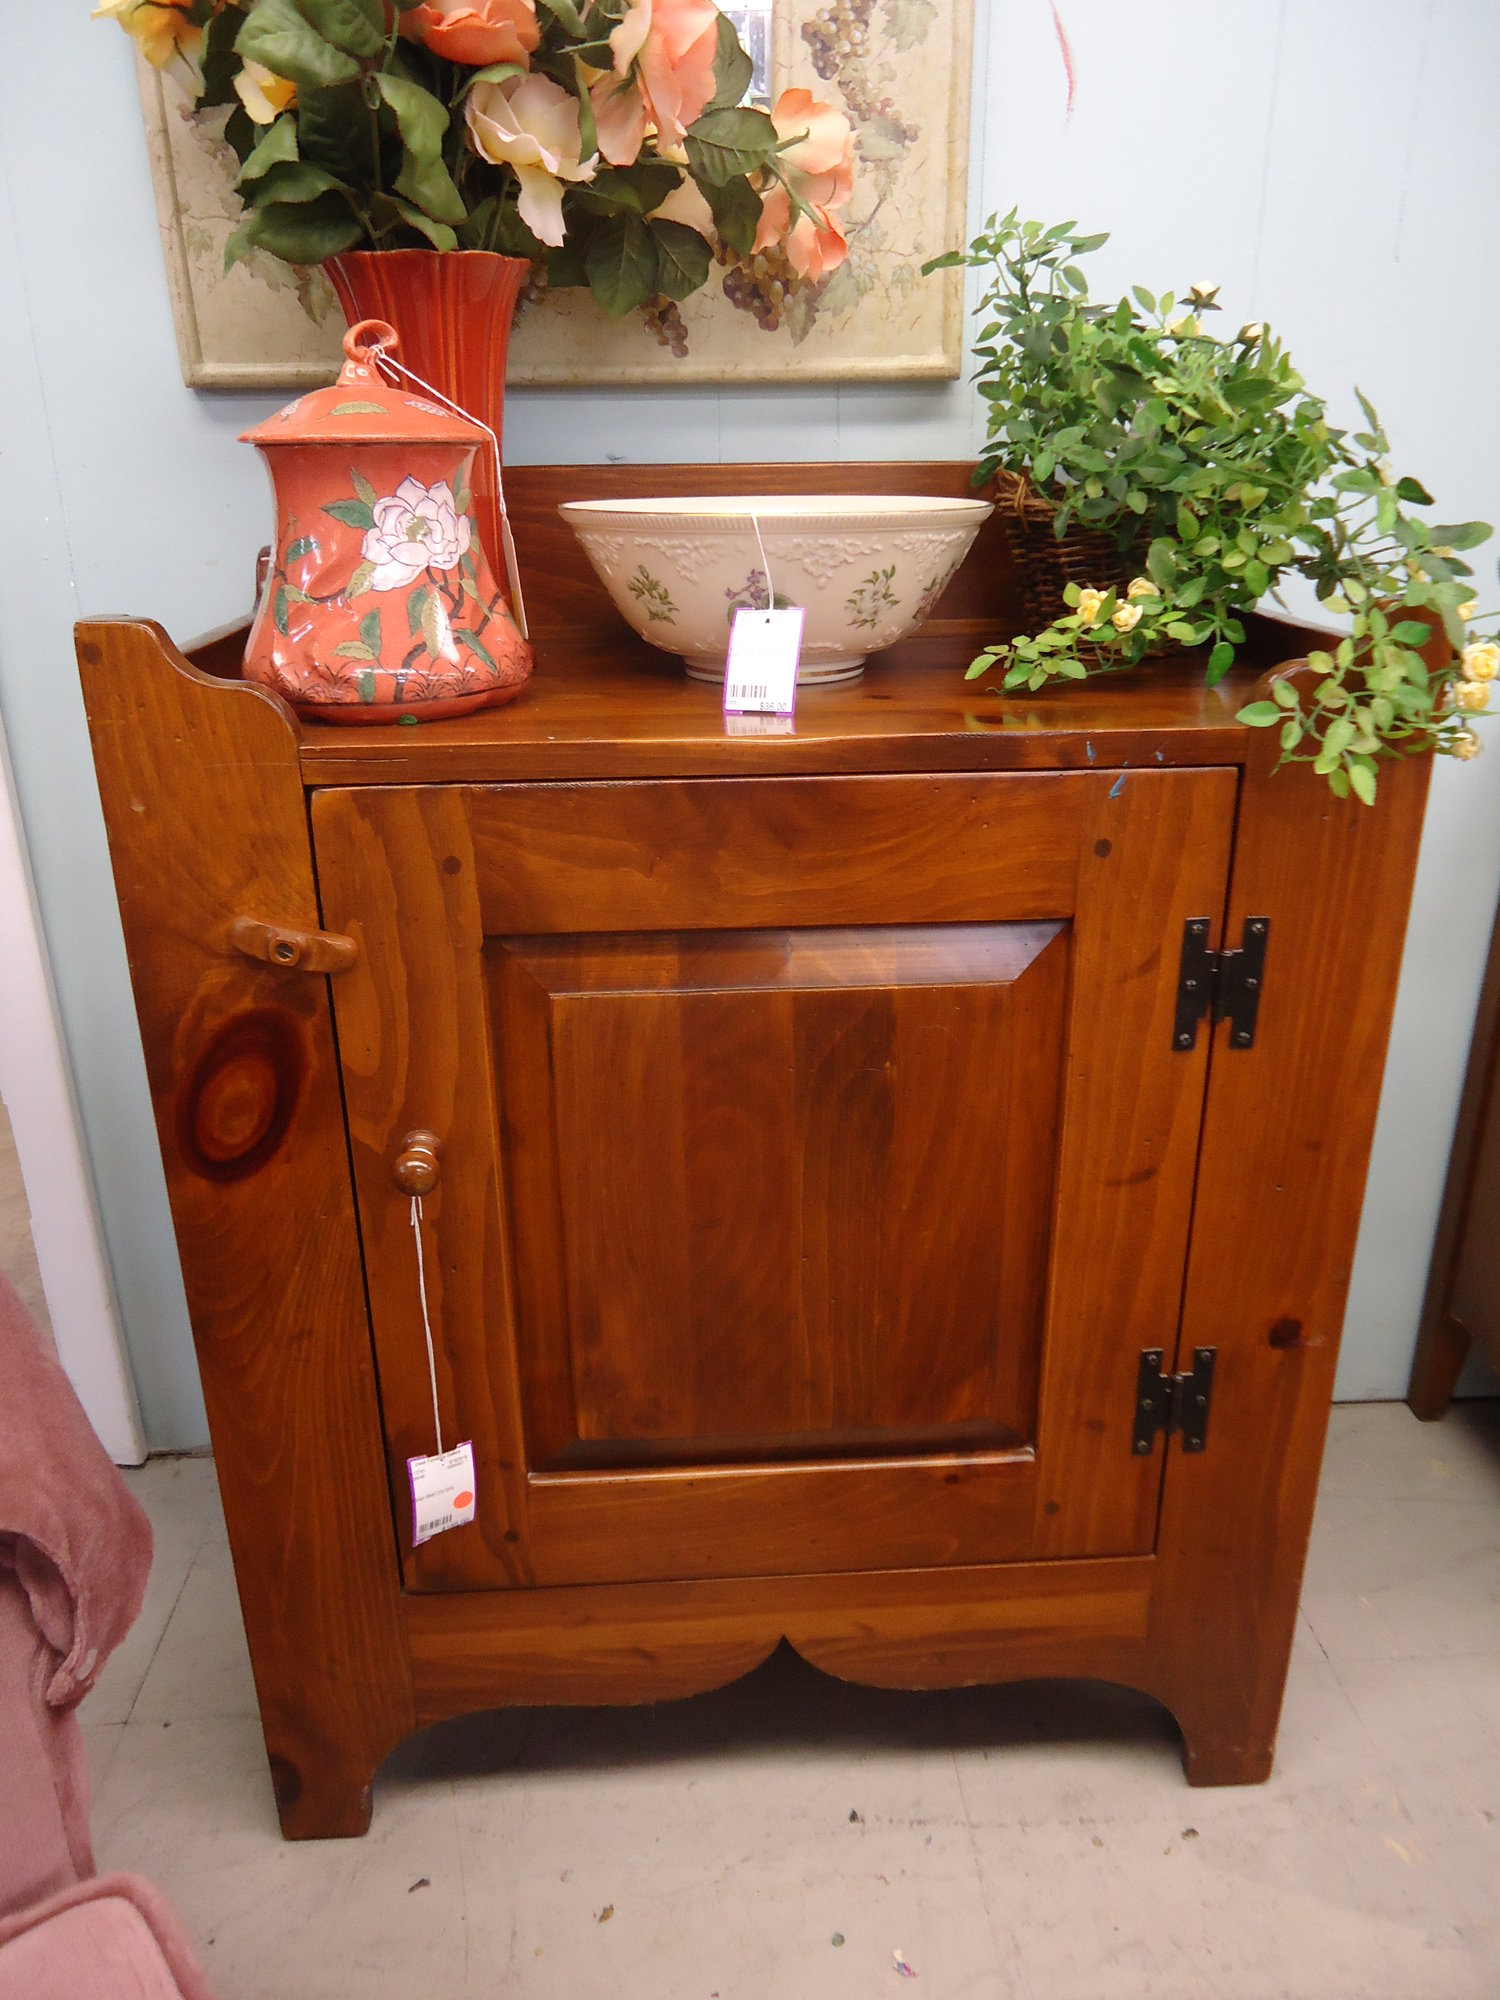 1 13741 Ethan Allen Pine Dry Sink